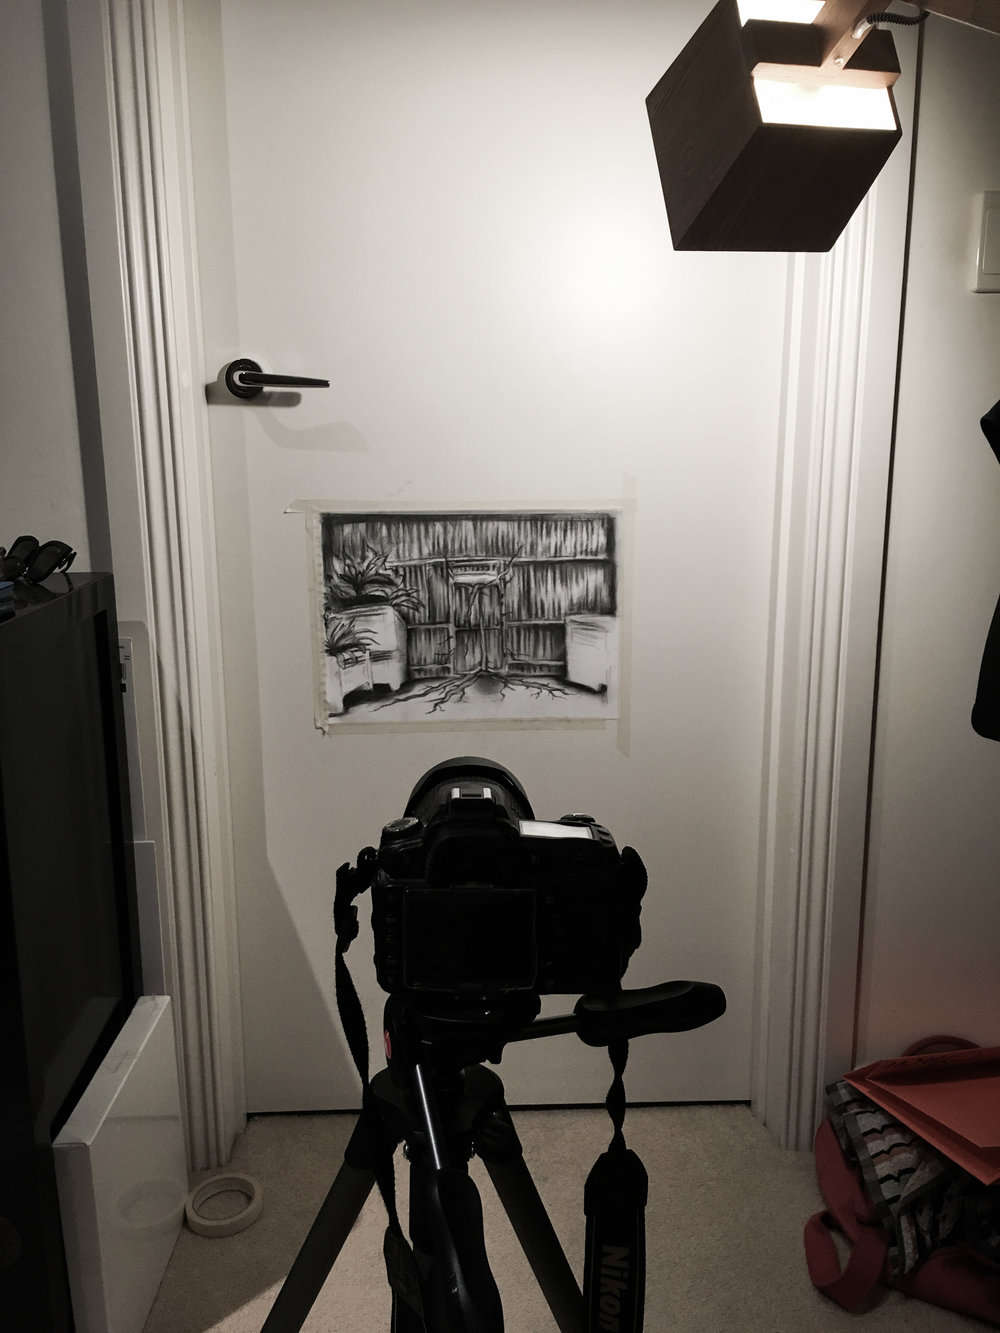 Camera and sketch set up